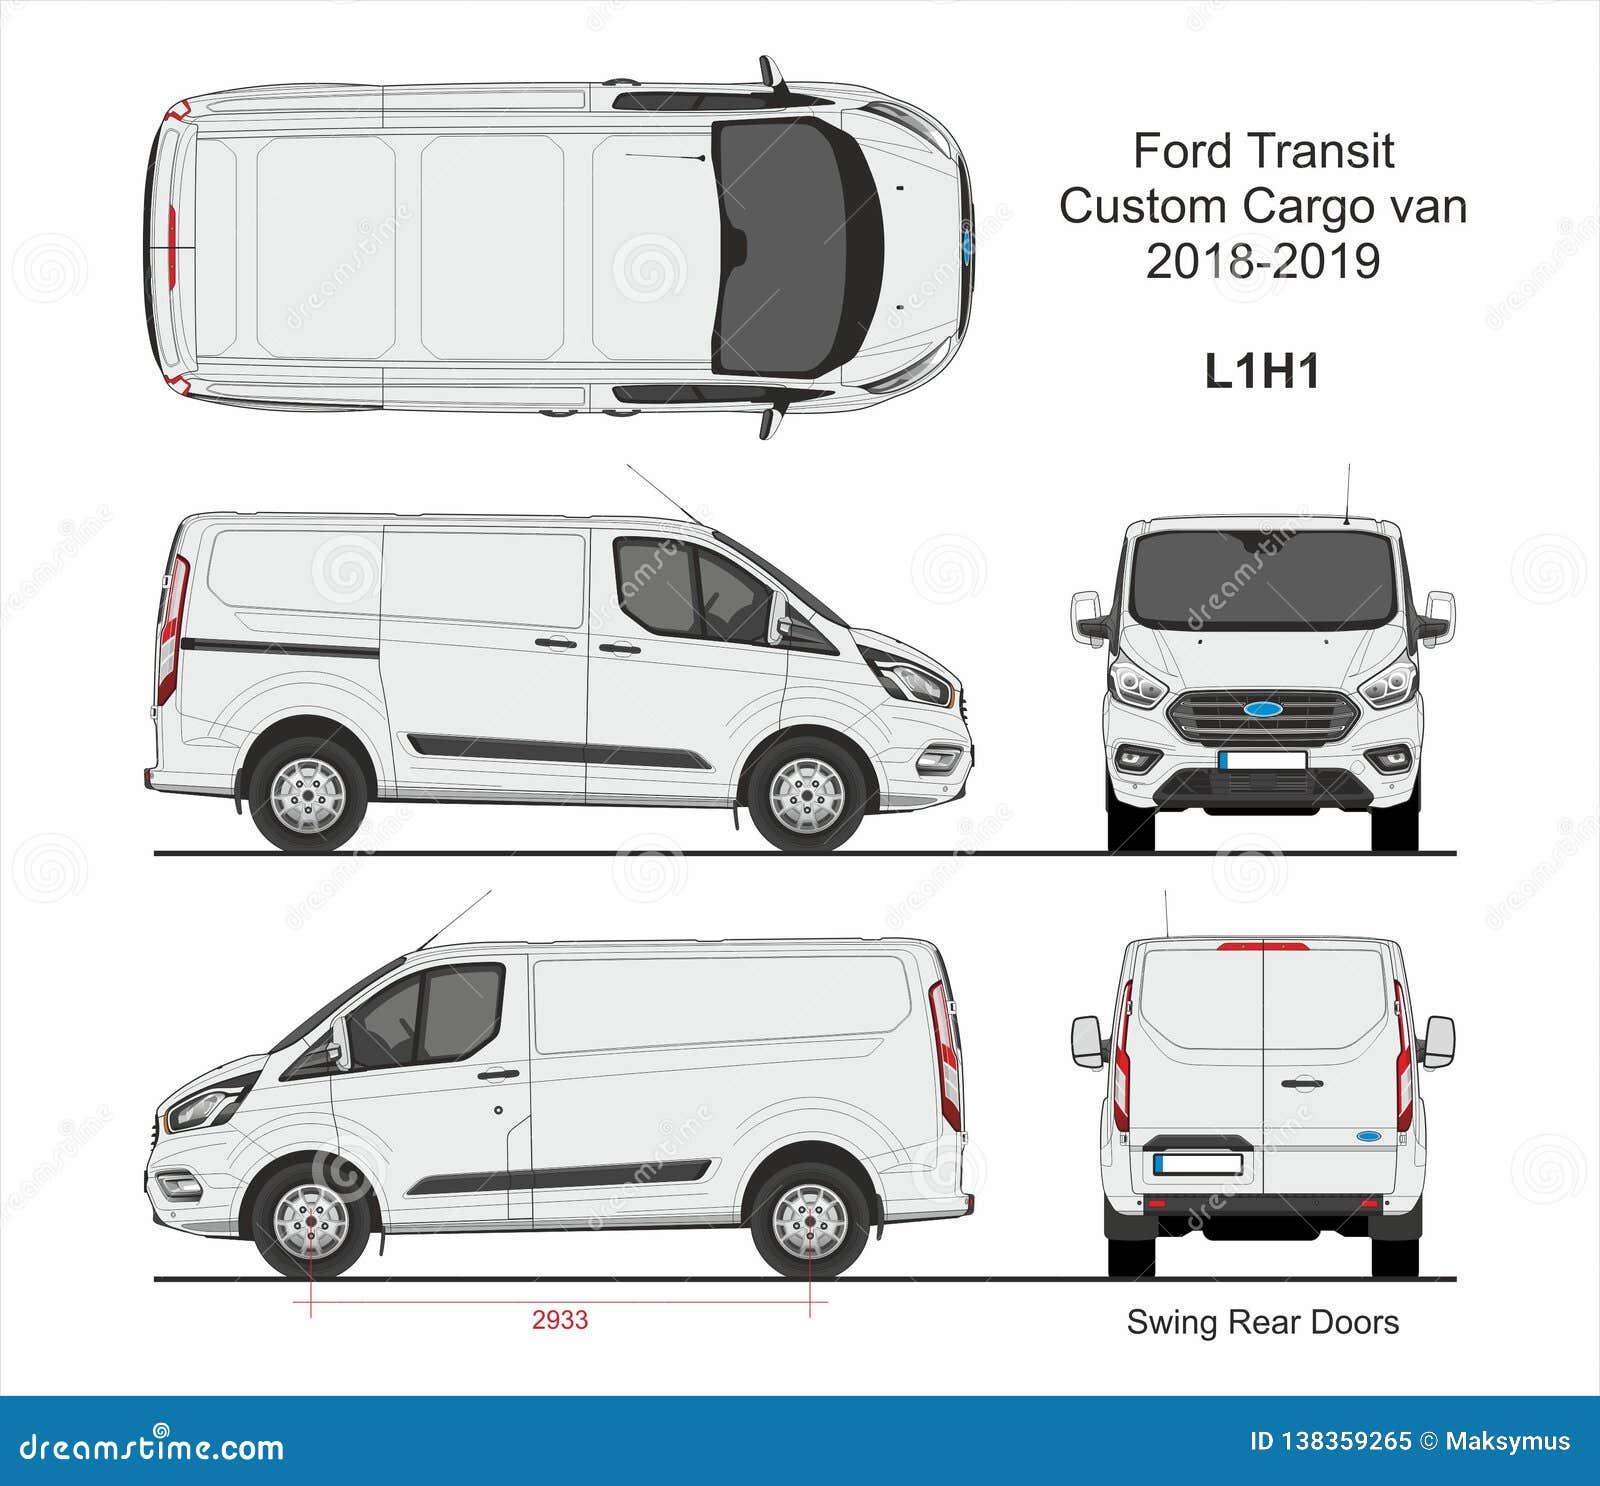 10 Ford Transit 15str Minibus: Ford Transit Custom Cargo Van L1H1 2018-2019 Editorial